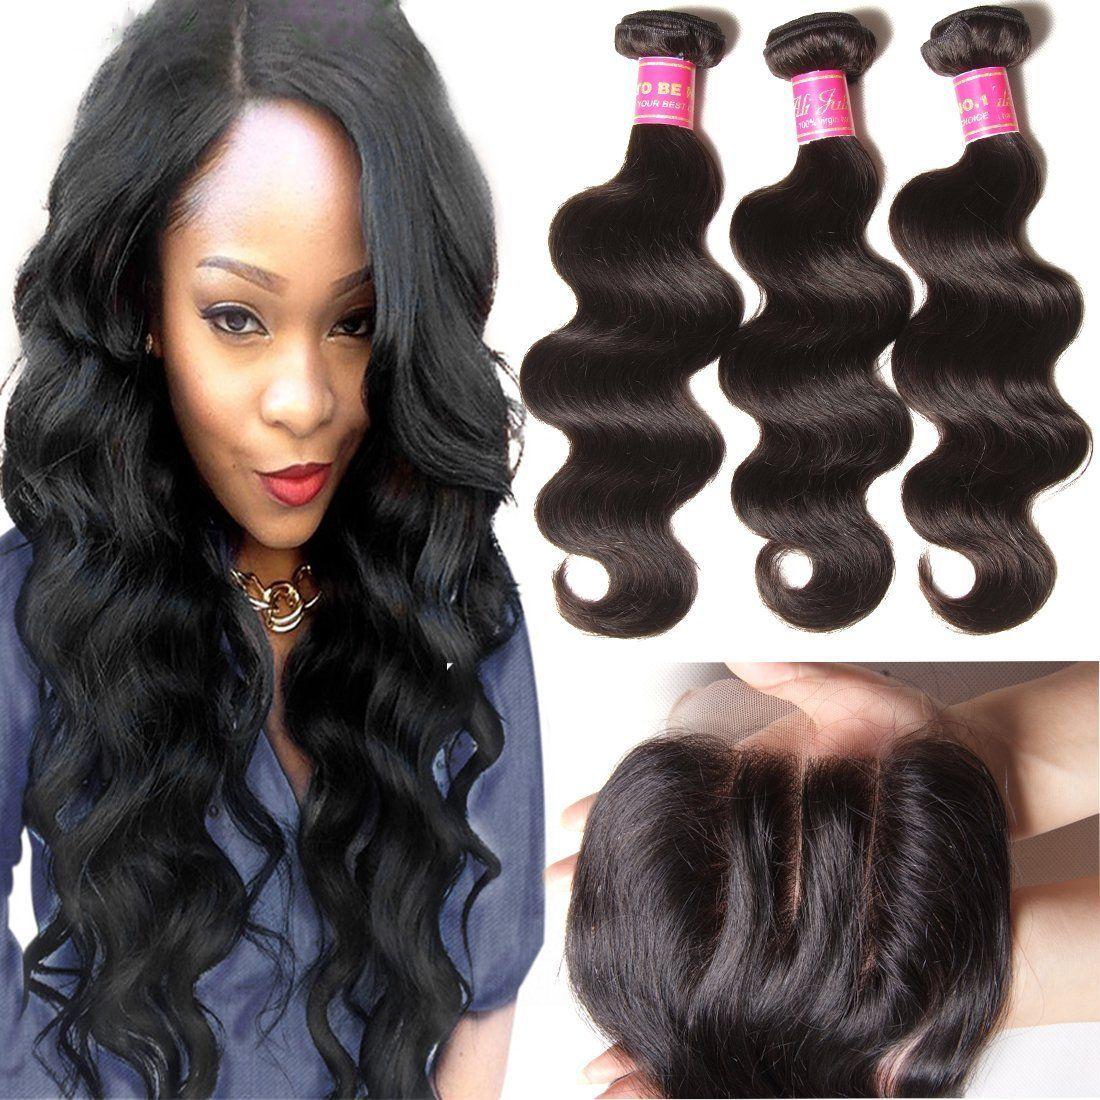 Ali Julia 12 14 1610 Inch Brazilian Virgin Body Wave Hair Weft 3